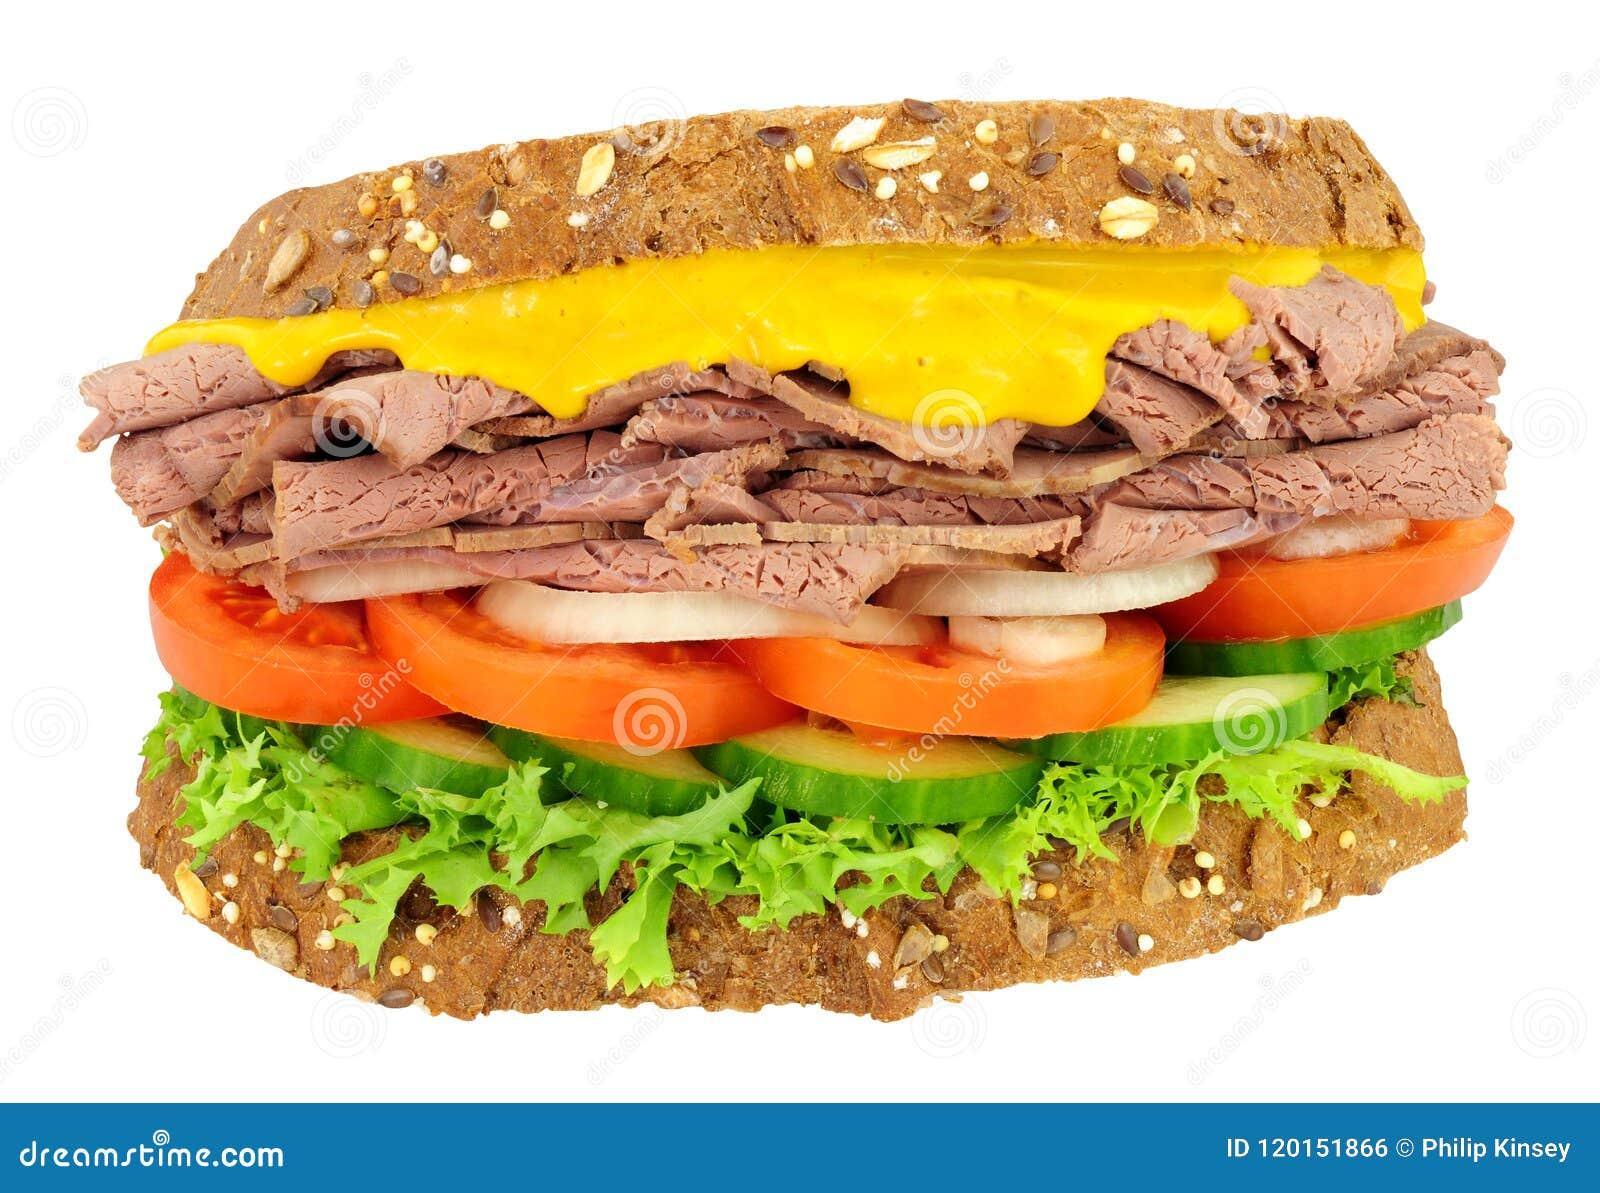 Roast Beef And Salad Sandwich